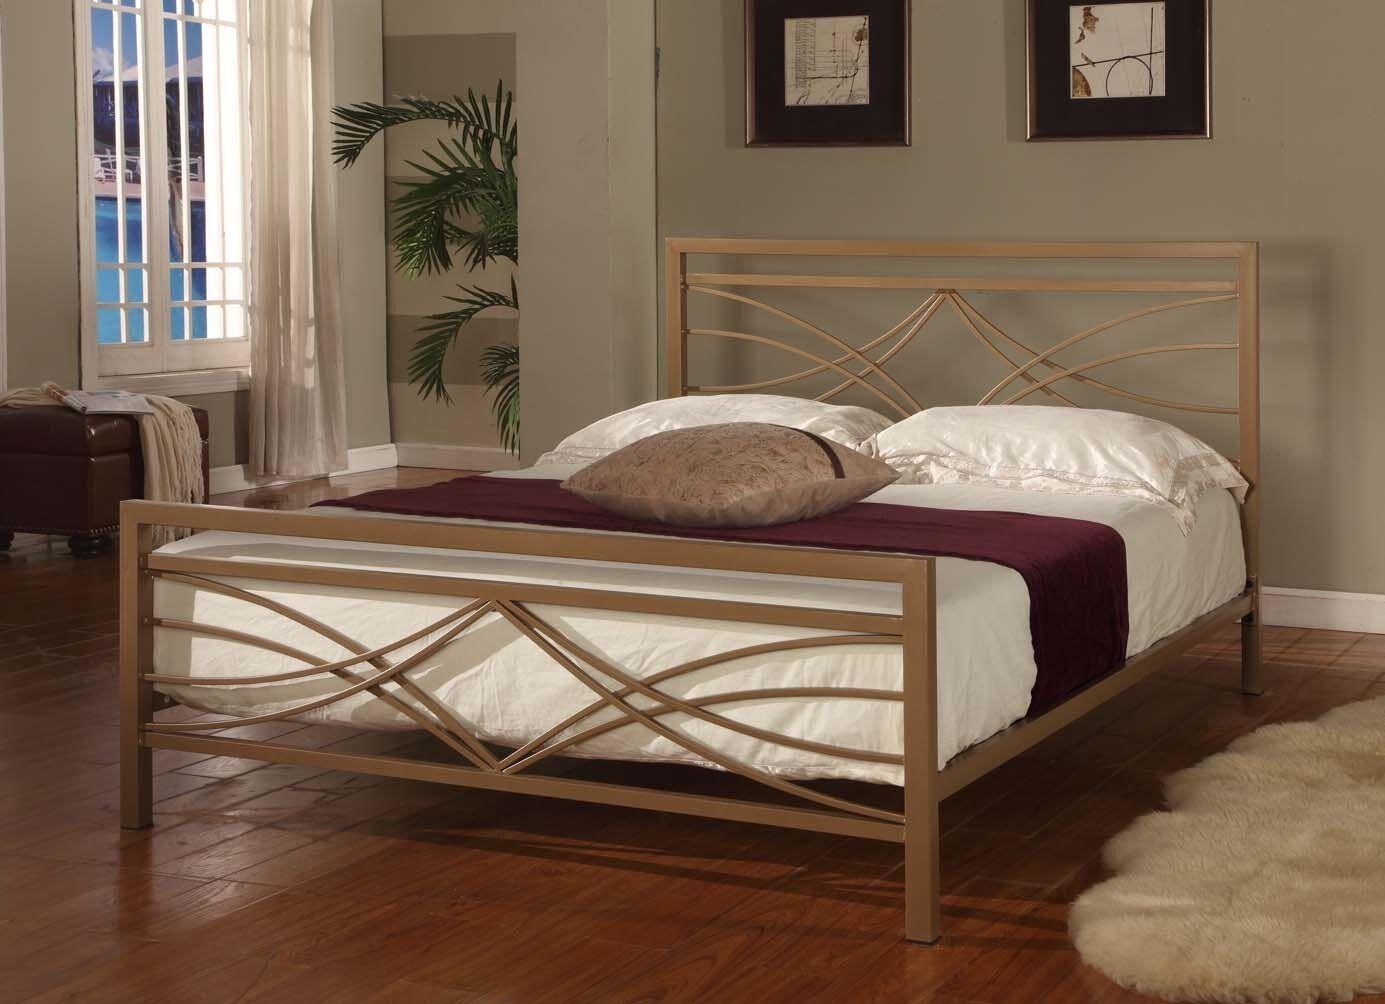 golden finish full size bed headboard footboard rails metal slats new ebay. Black Bedroom Furniture Sets. Home Design Ideas